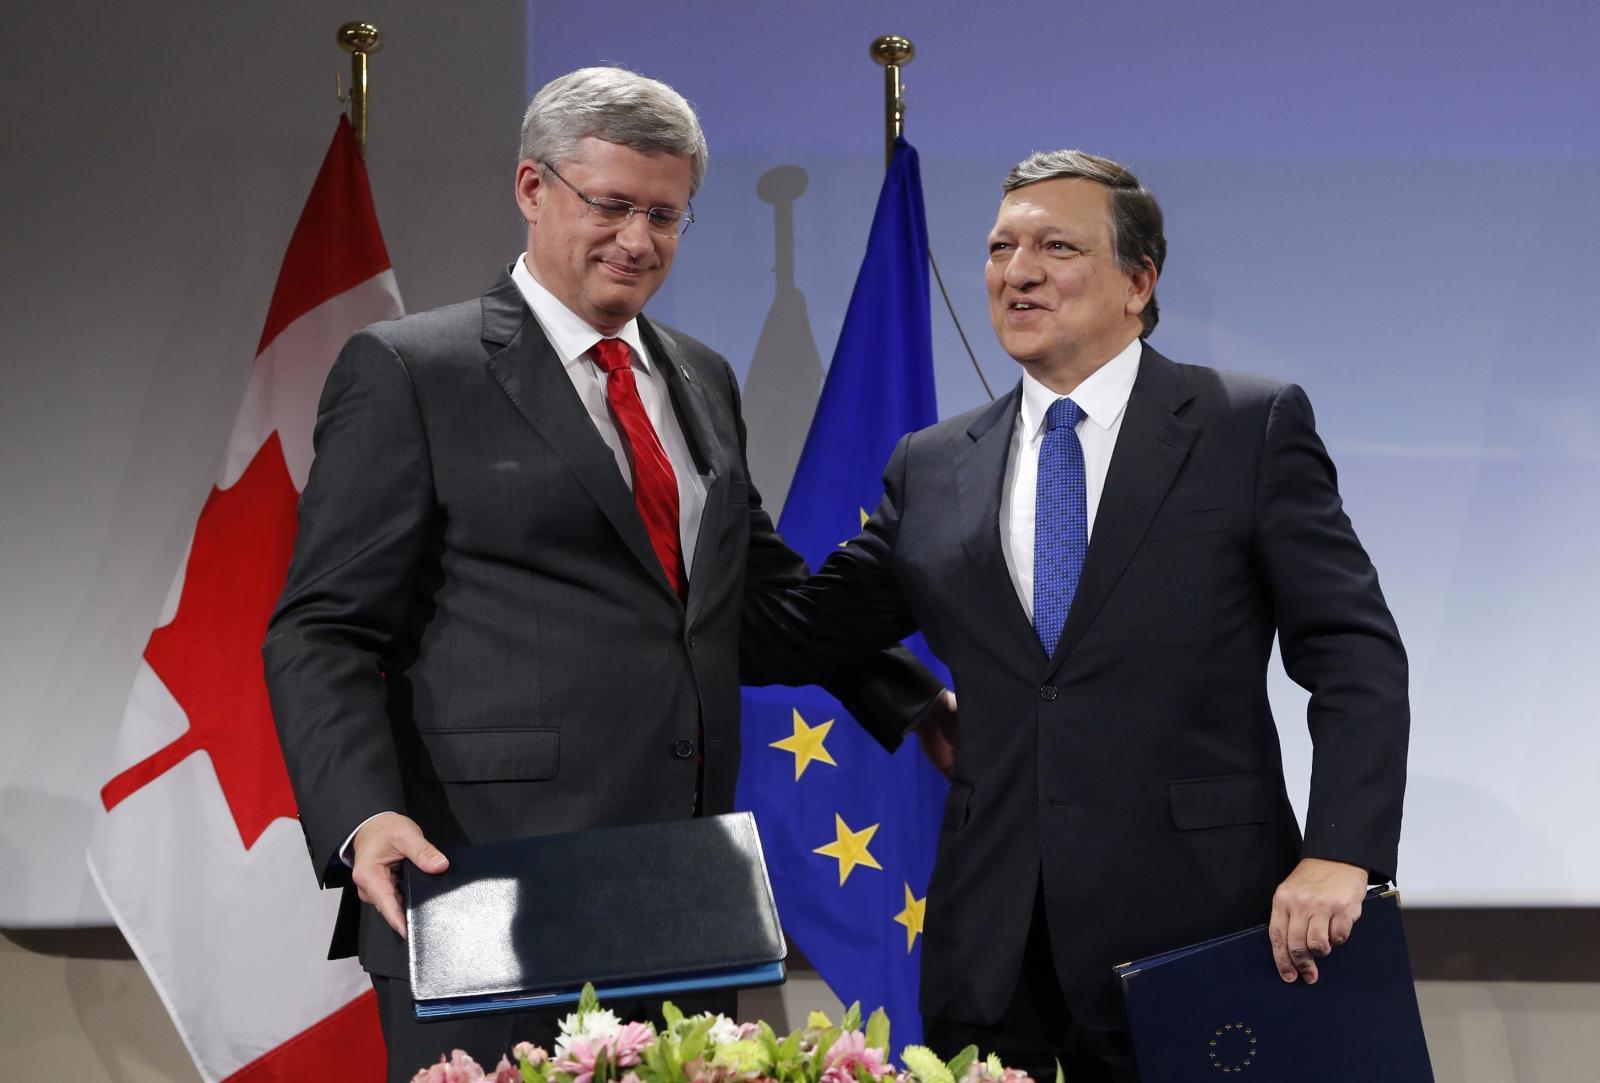 EU-Canada Free Trade Agreement